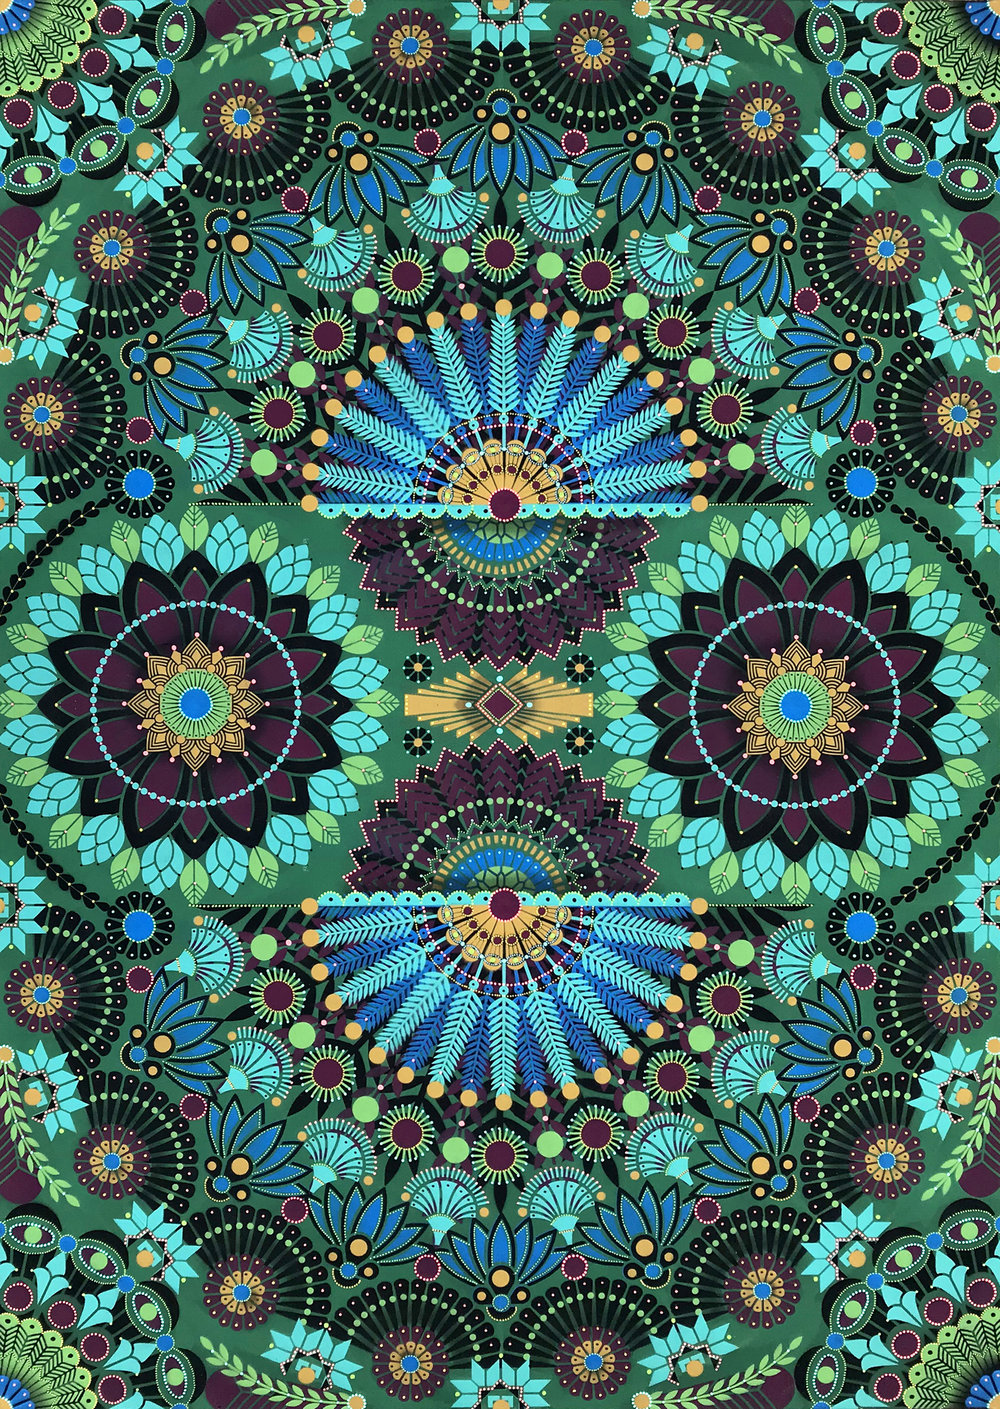 Kaleidoscopic Nature #6  - Acrylic on canvas, 162 x 114 cm   2018